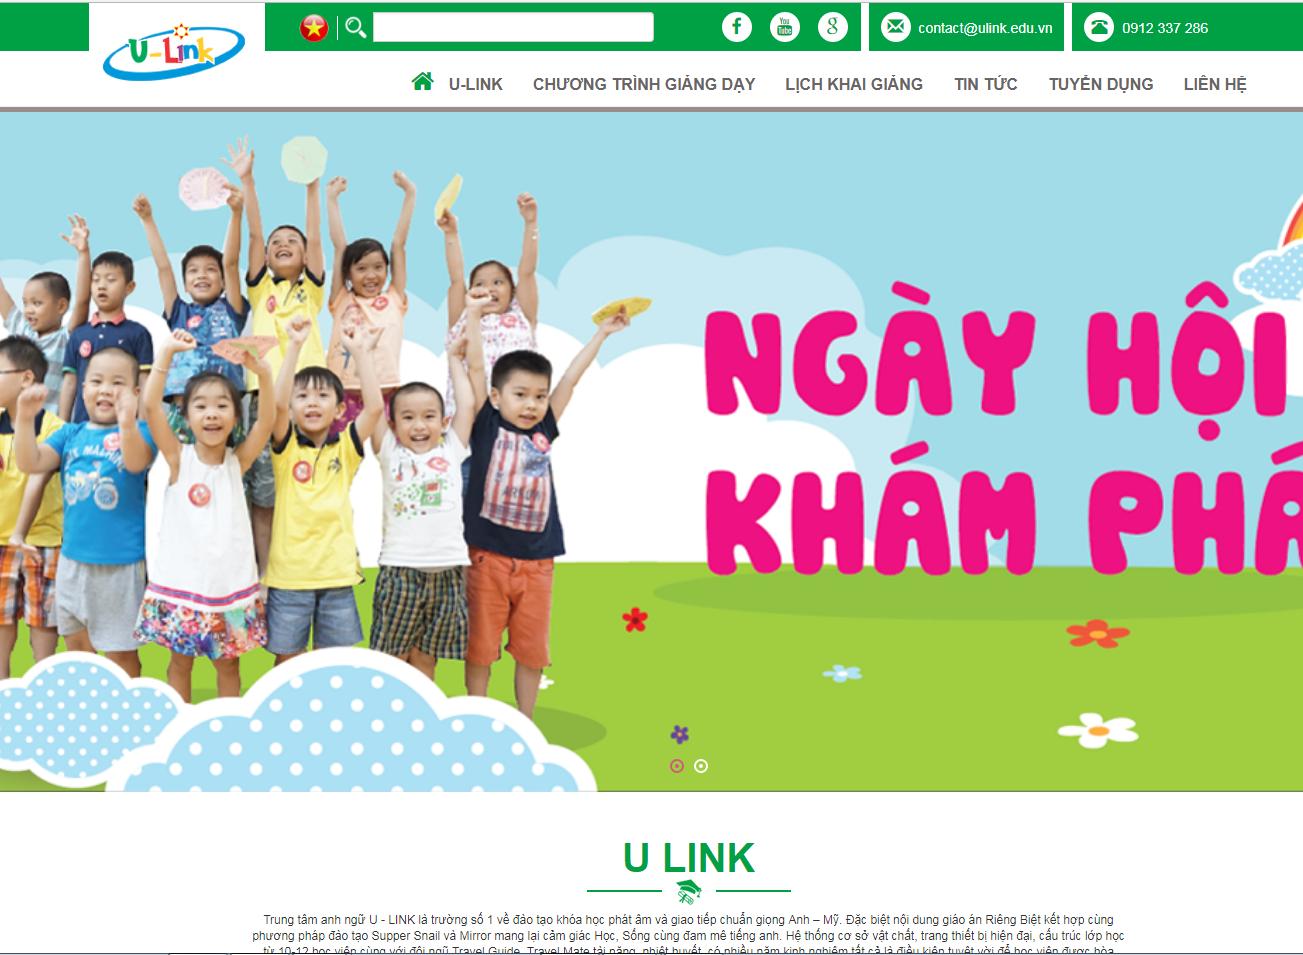 Web giao dục trung tâm u-link